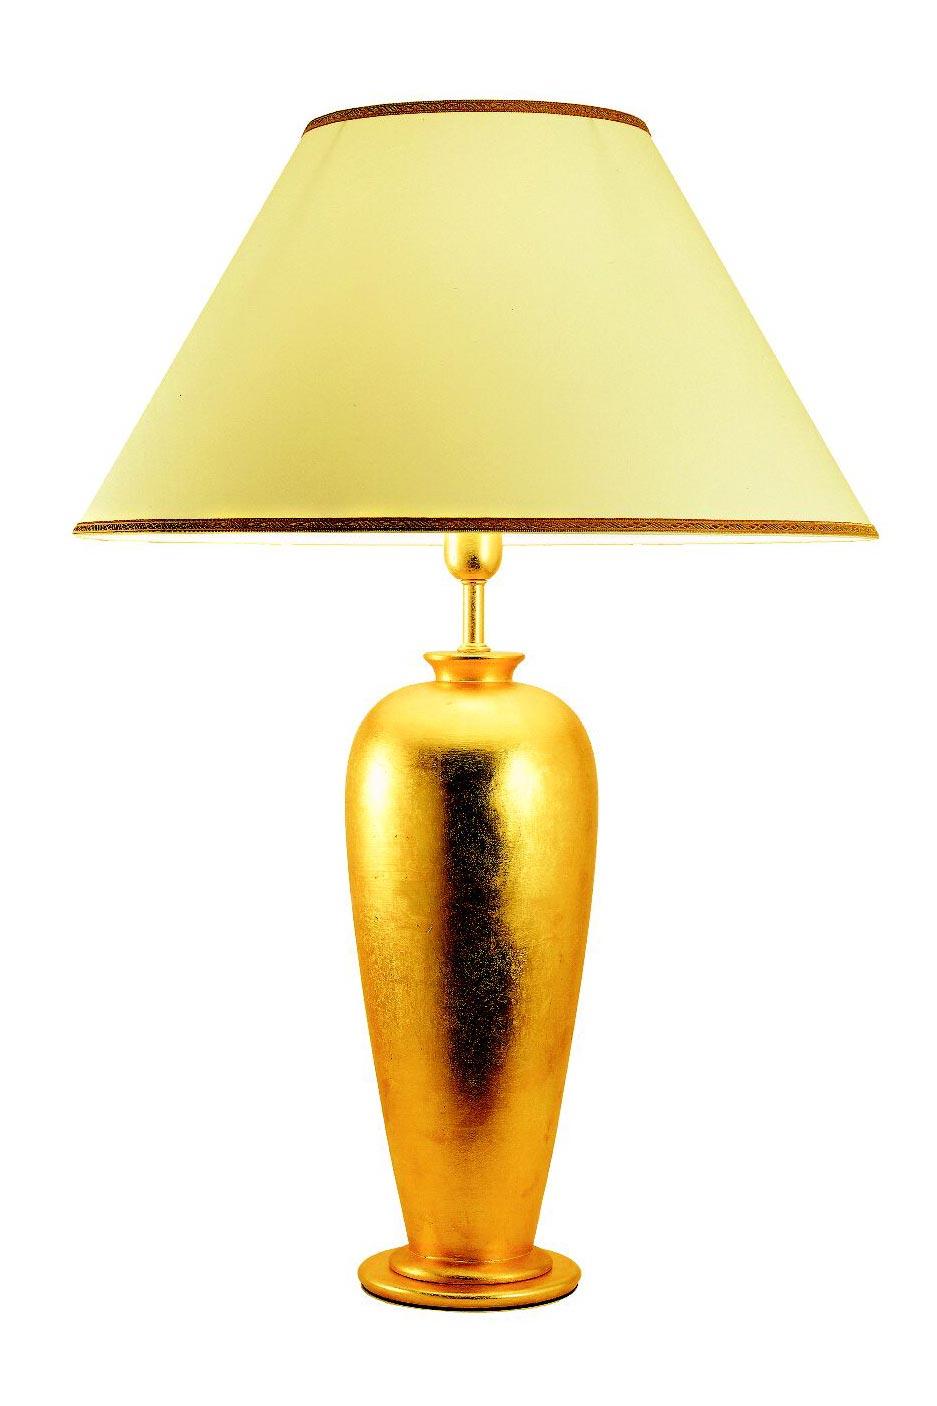 Lampe feuille d